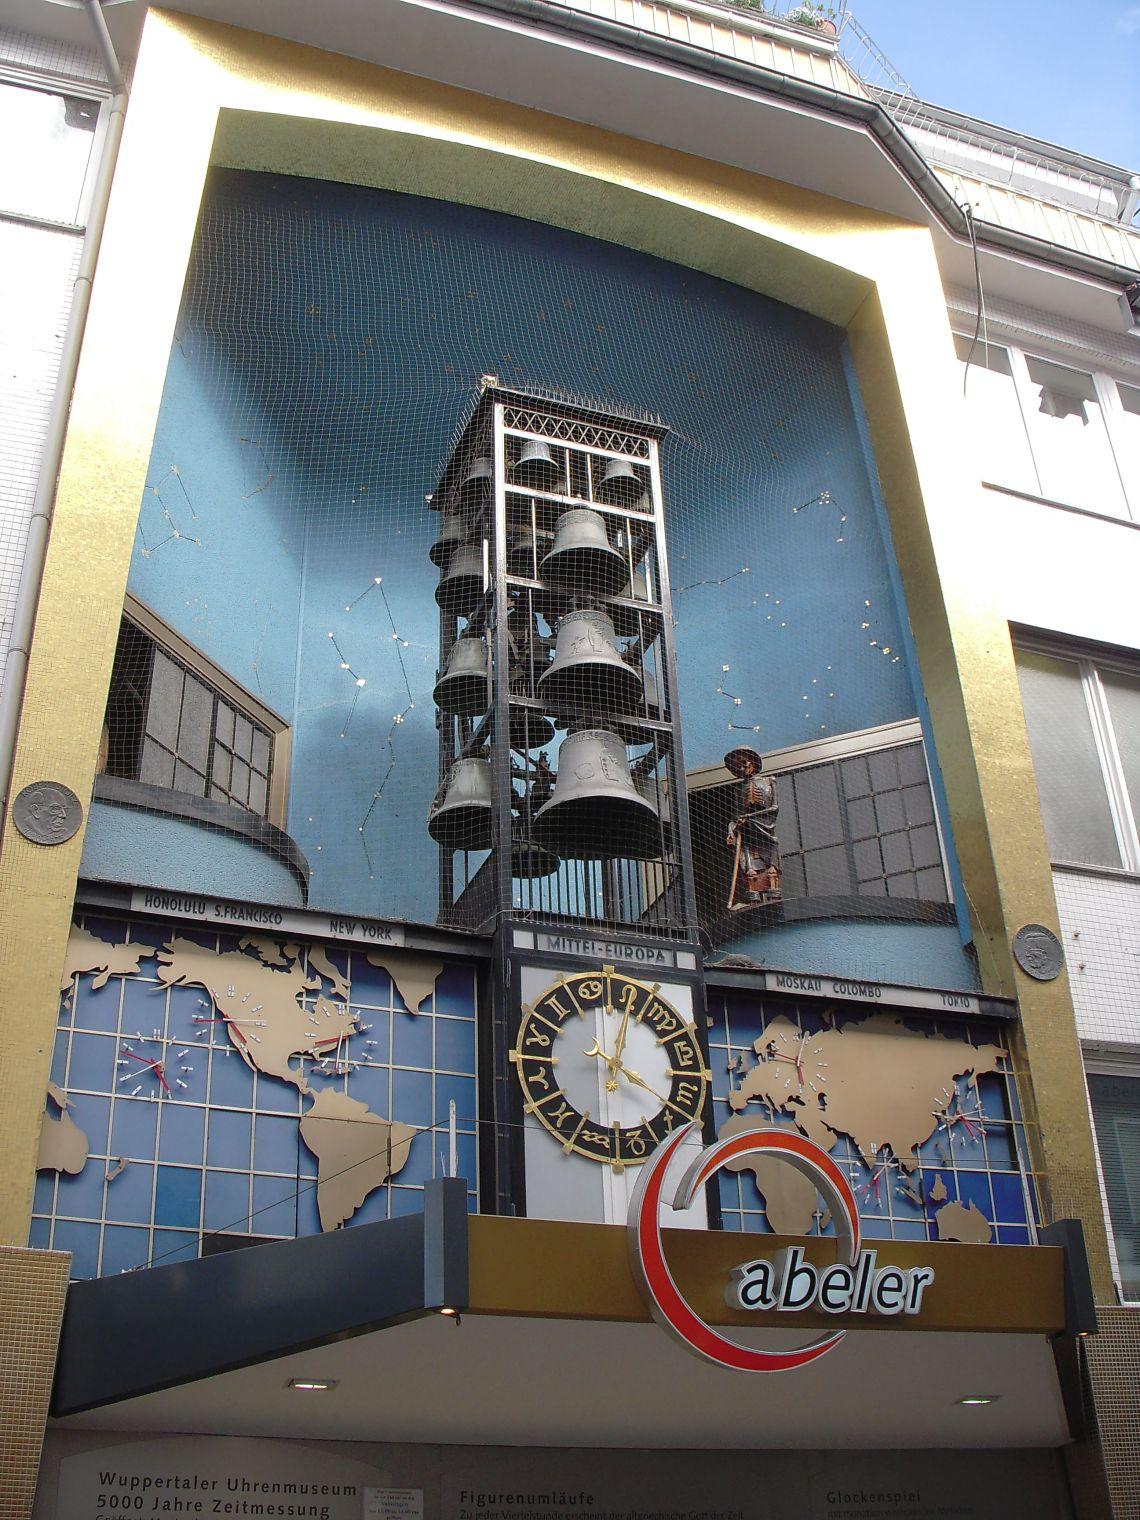 Wuppertaler Uhrenmuseum, Klokkenspel en ereldklokken, 23 april 2012. Foto met dank aan BKP, CC BY-SA 3.0